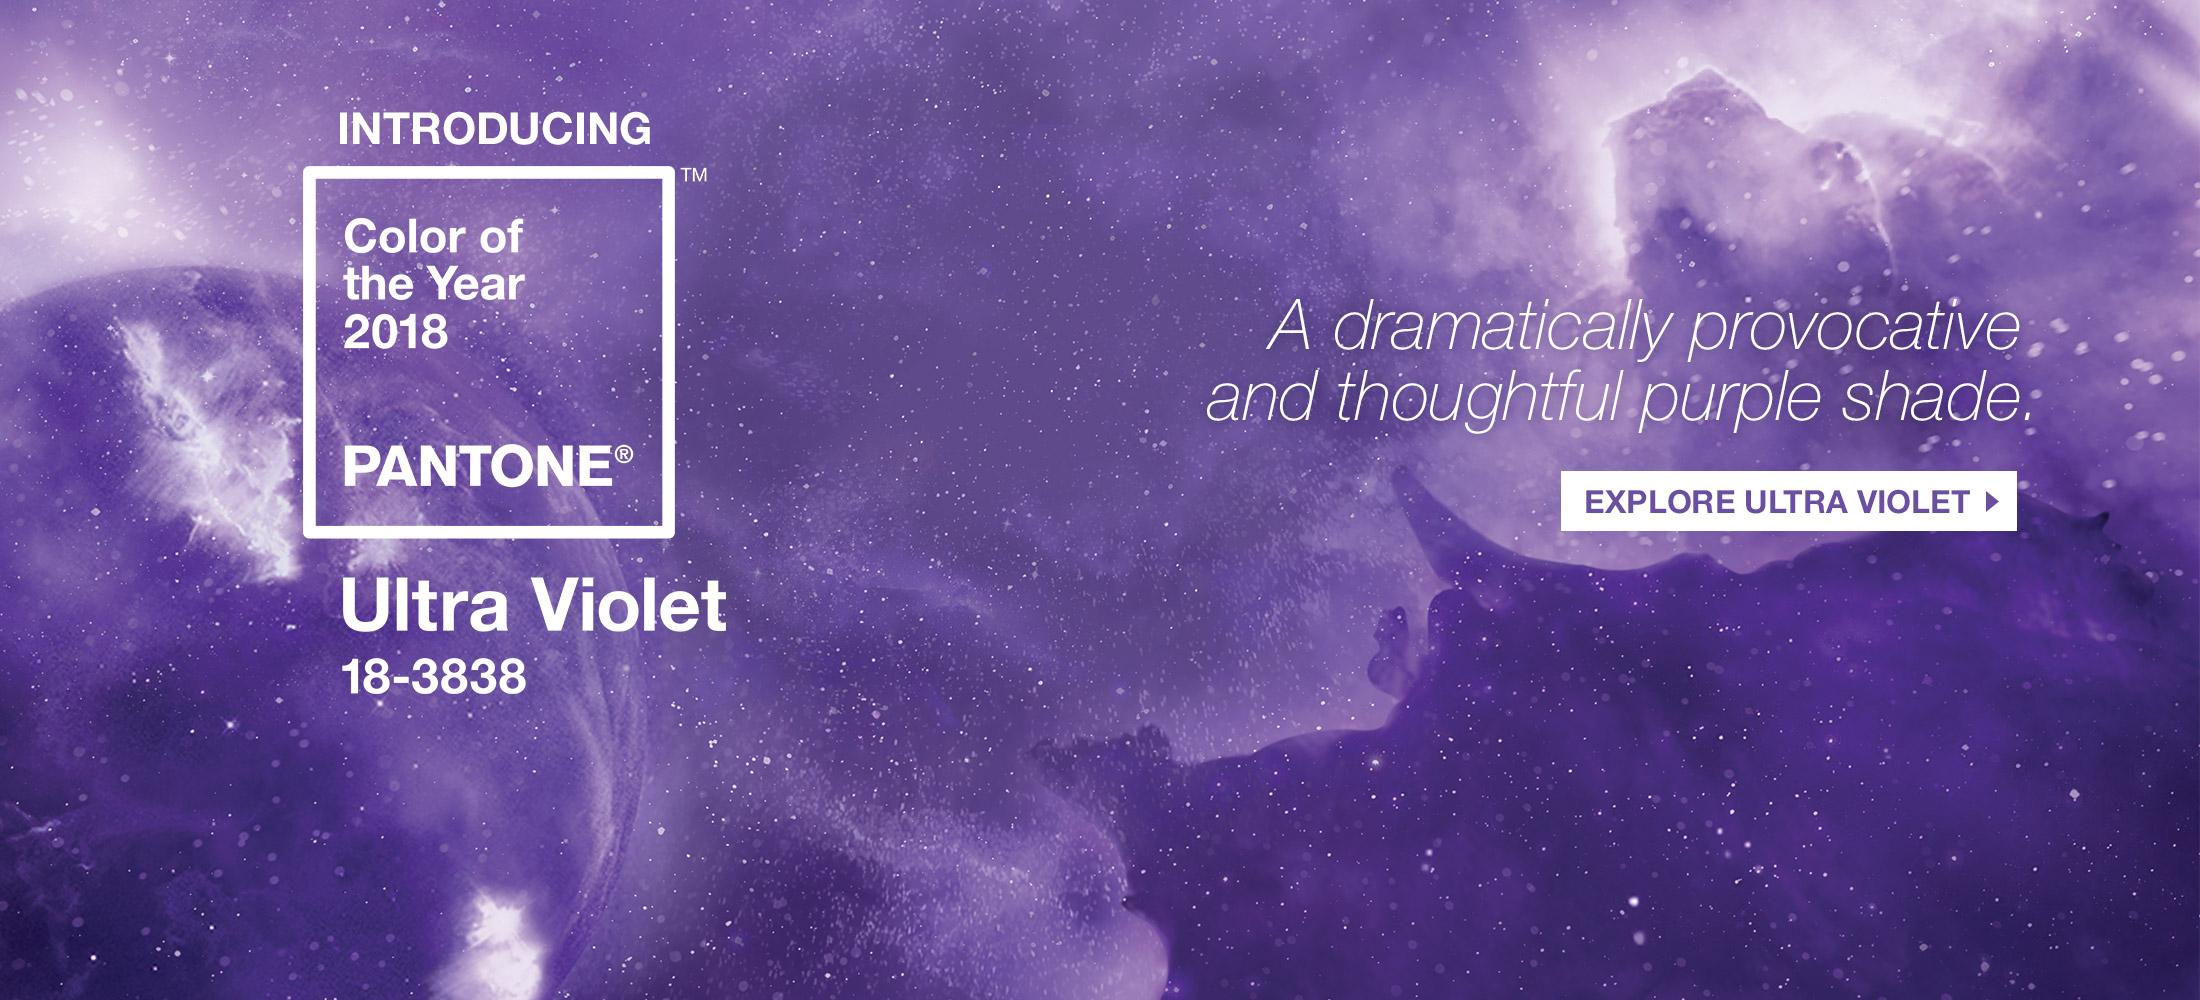 Pantone Color of the Year - Ultra Violet - Artisan Pantone Printing